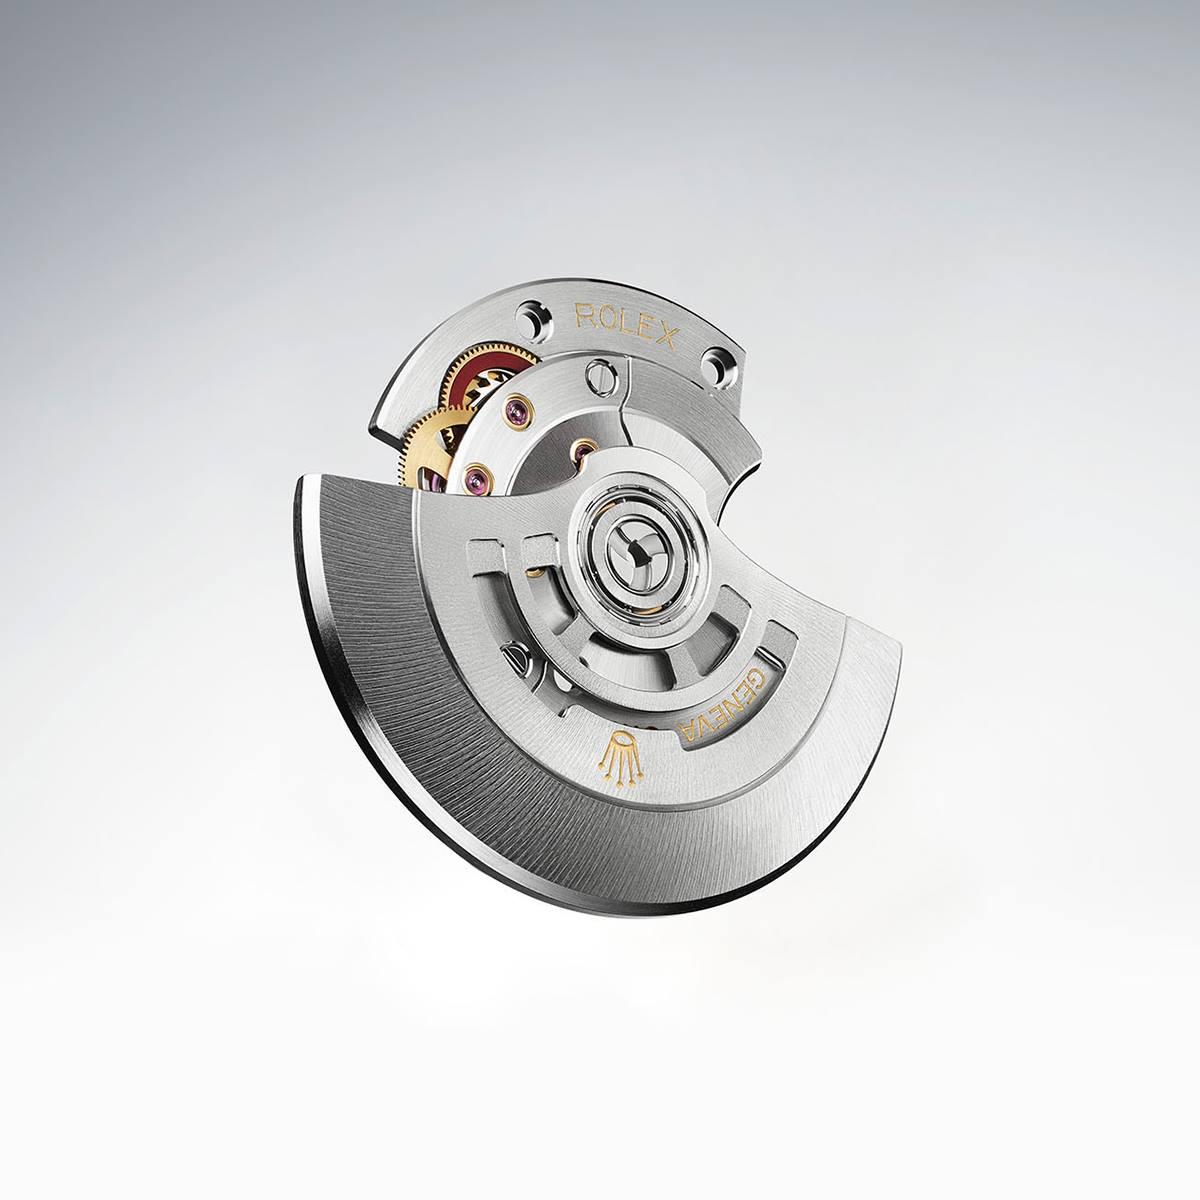 Rolex Perpetual Rotor